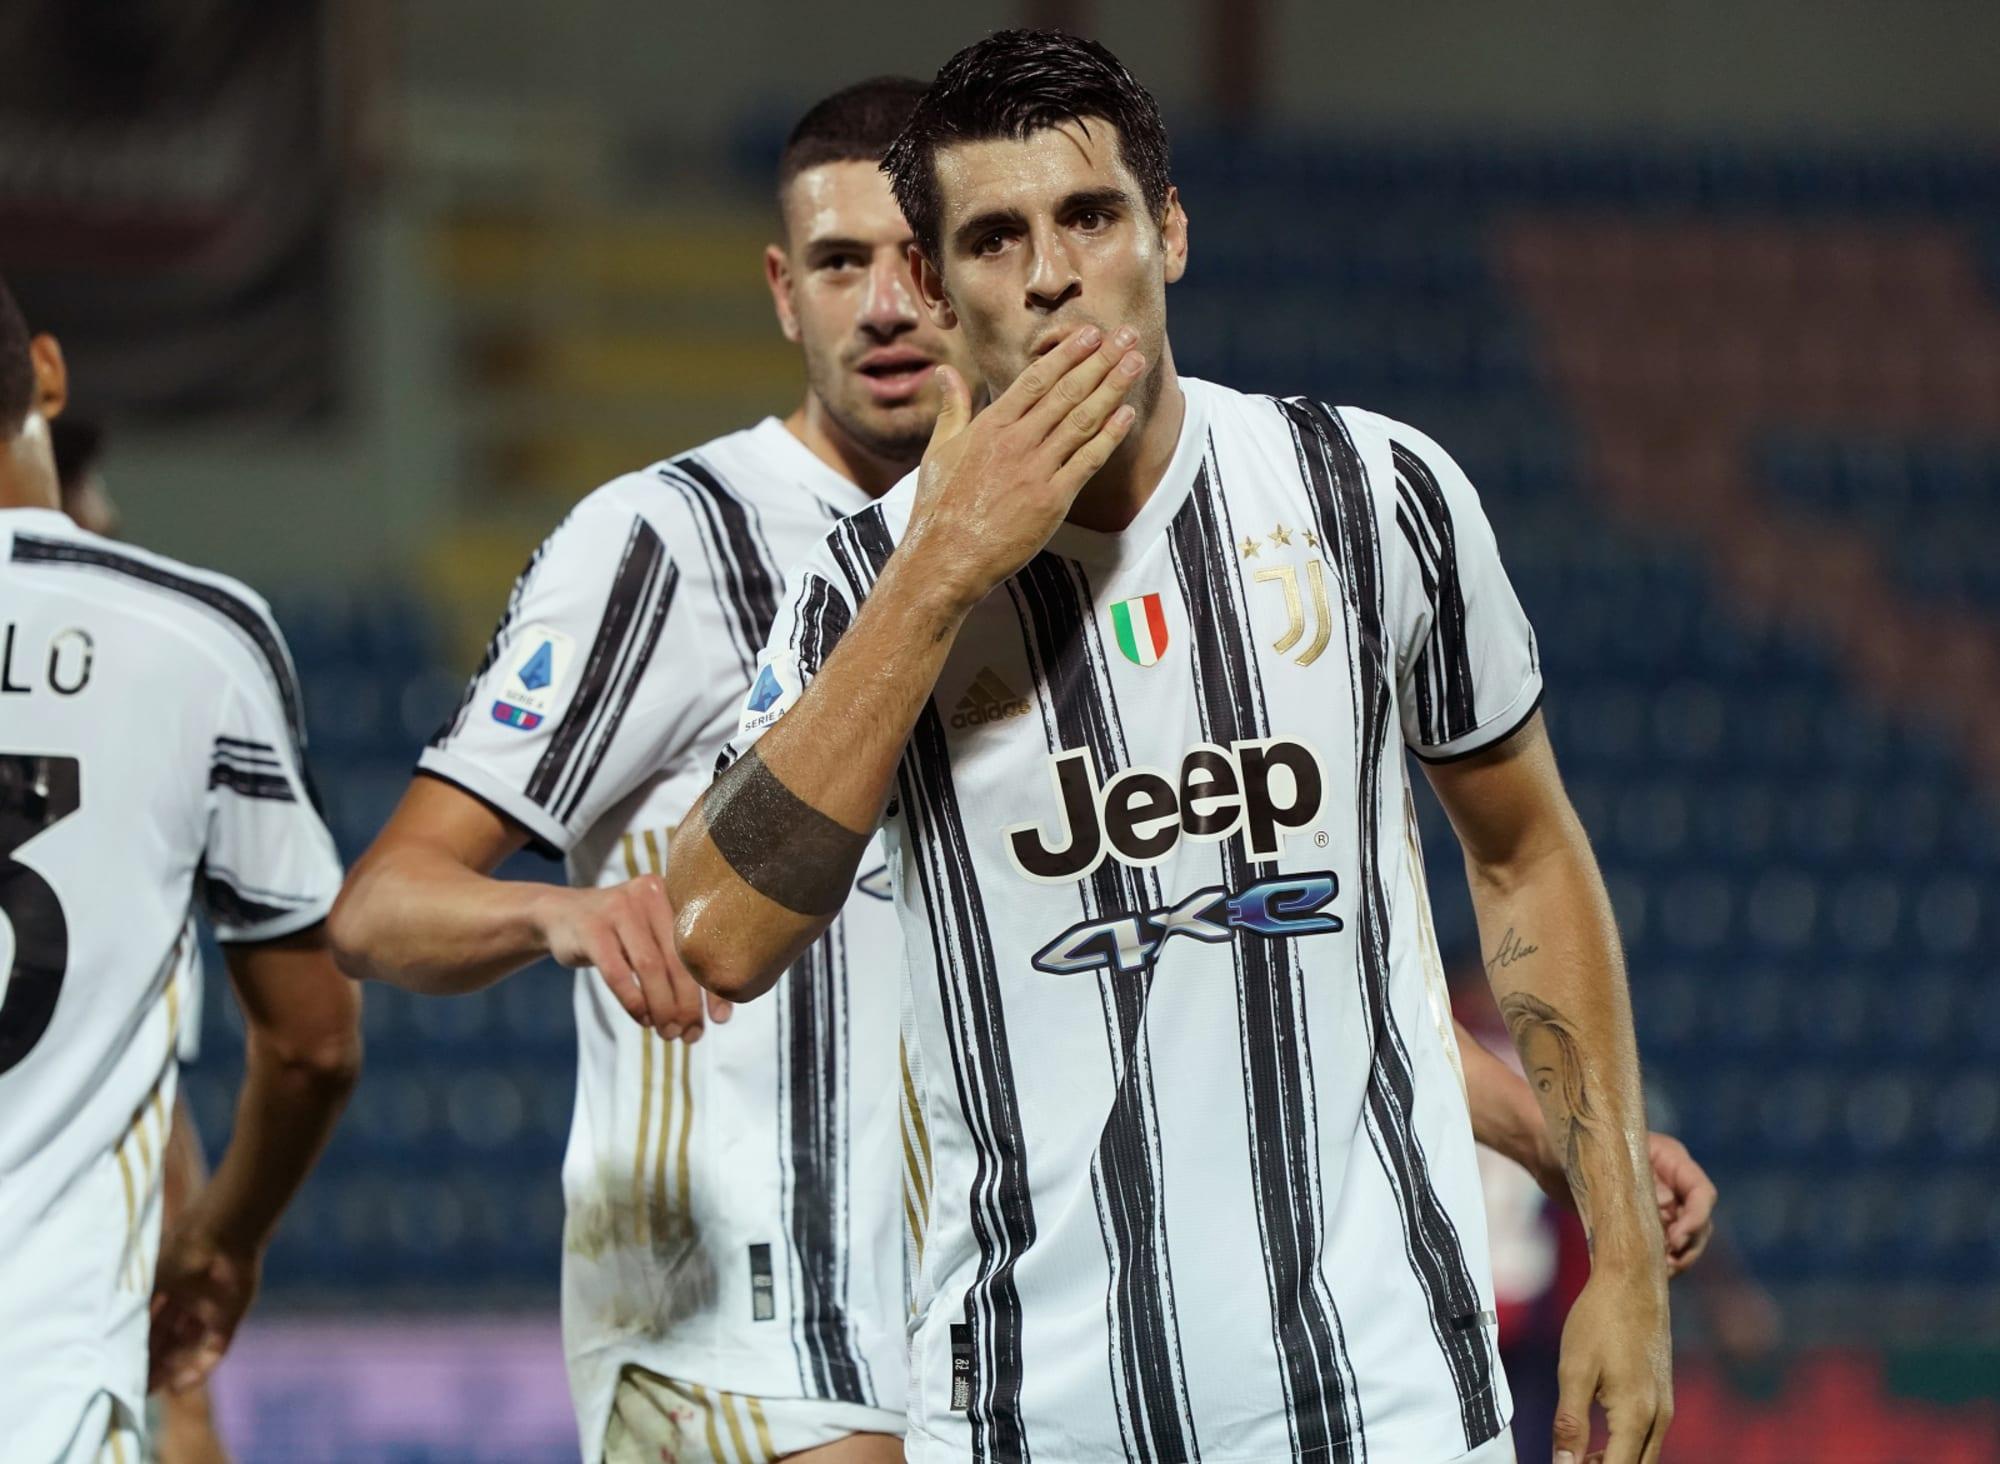 Juventus: 3 key players to watch against Dynamo Kyiv